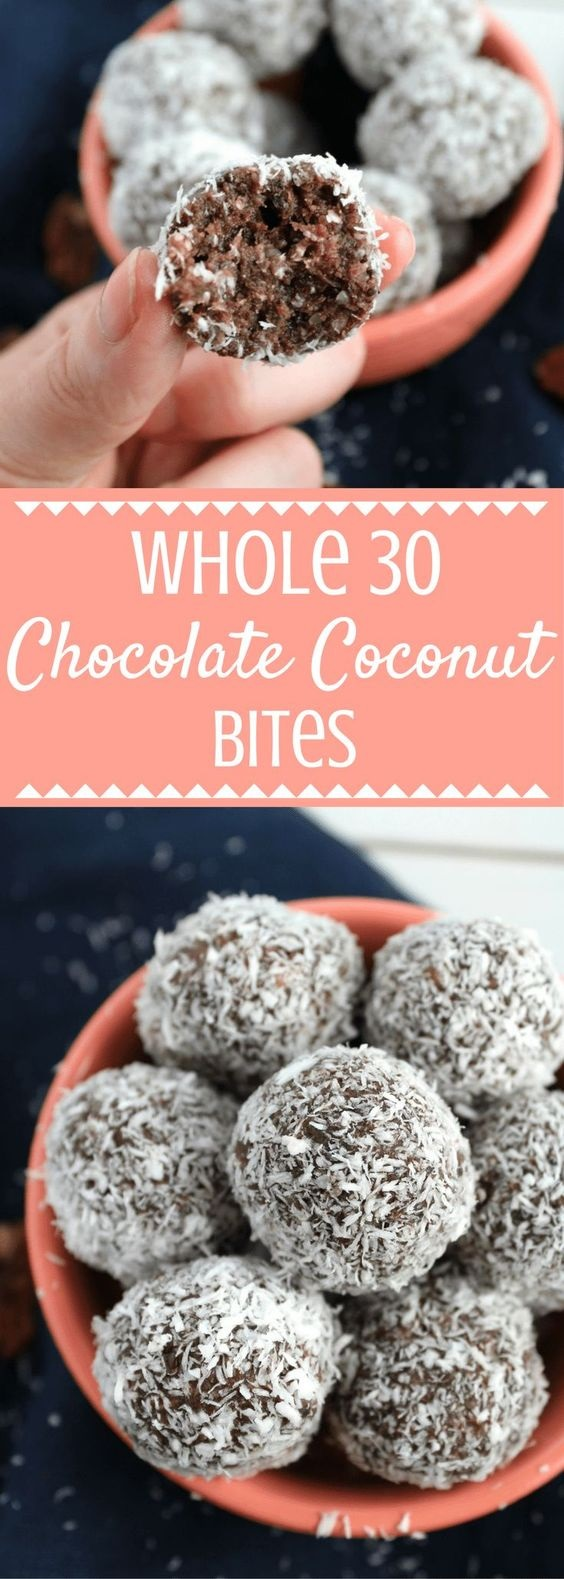 Whole 30 Chocolate Coconut Bites